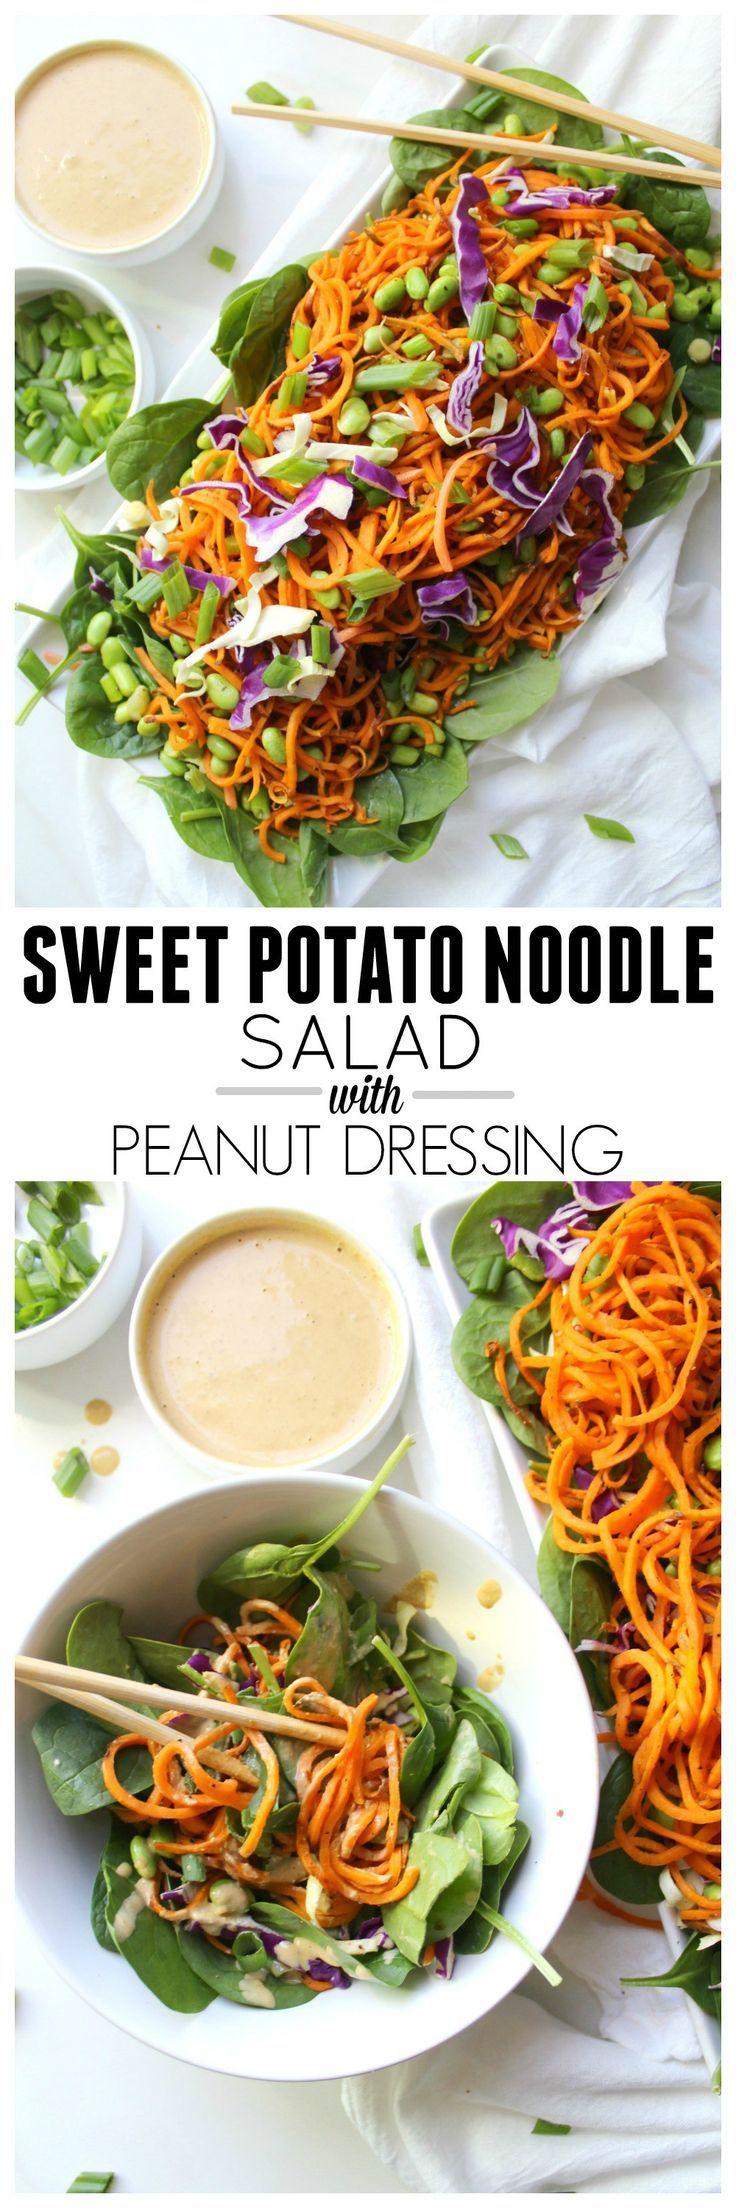 Sweet Potato Noodle Salad with Peanut Dressing   Vegan + GF   http://ThisSavoryVegan.com